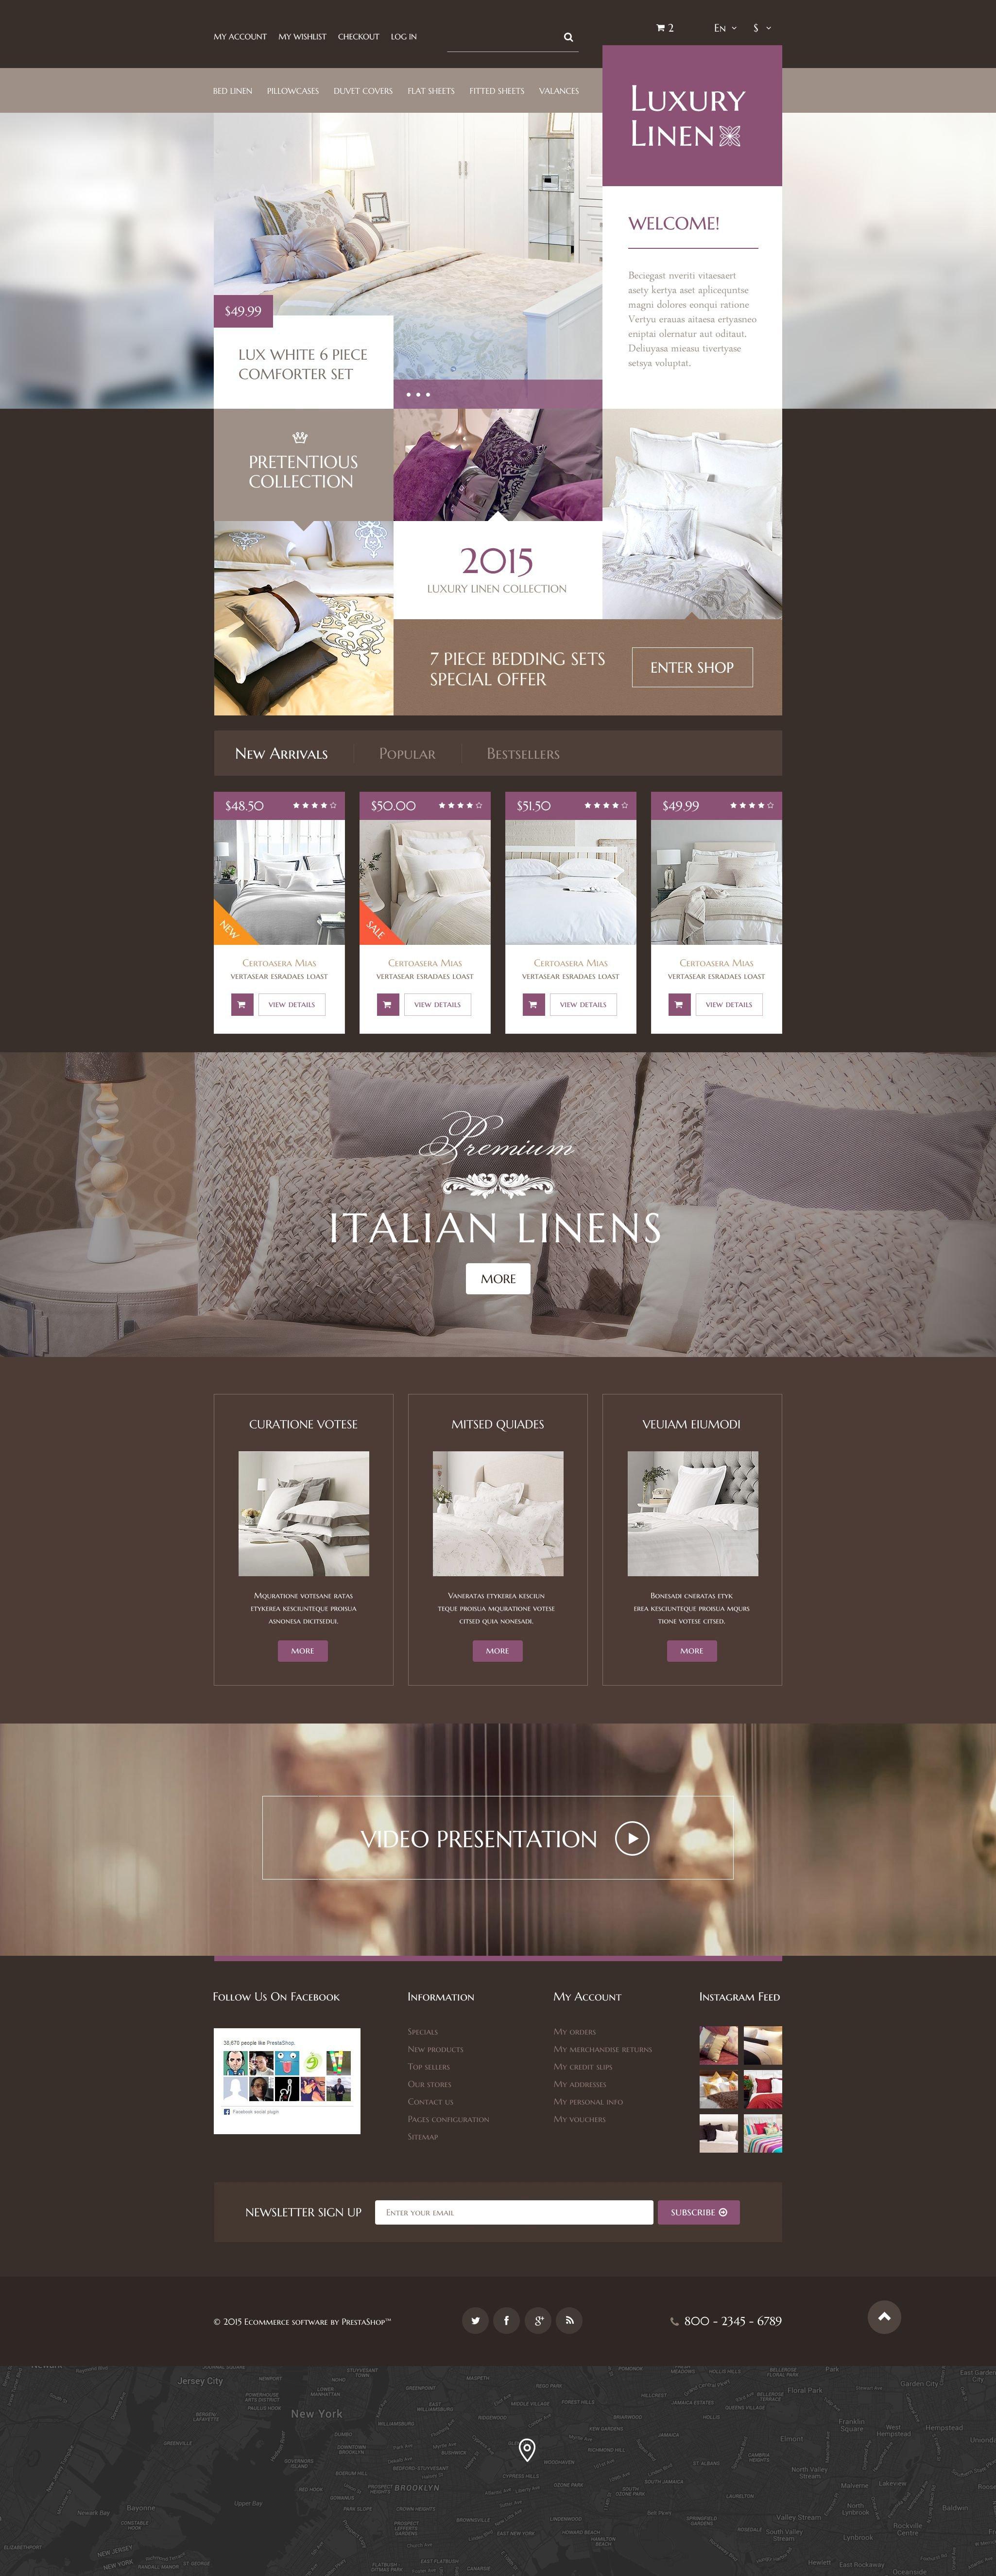 """Luxury Linen Store"" - адаптивний PrestaShop шаблон №54743 - скріншот"